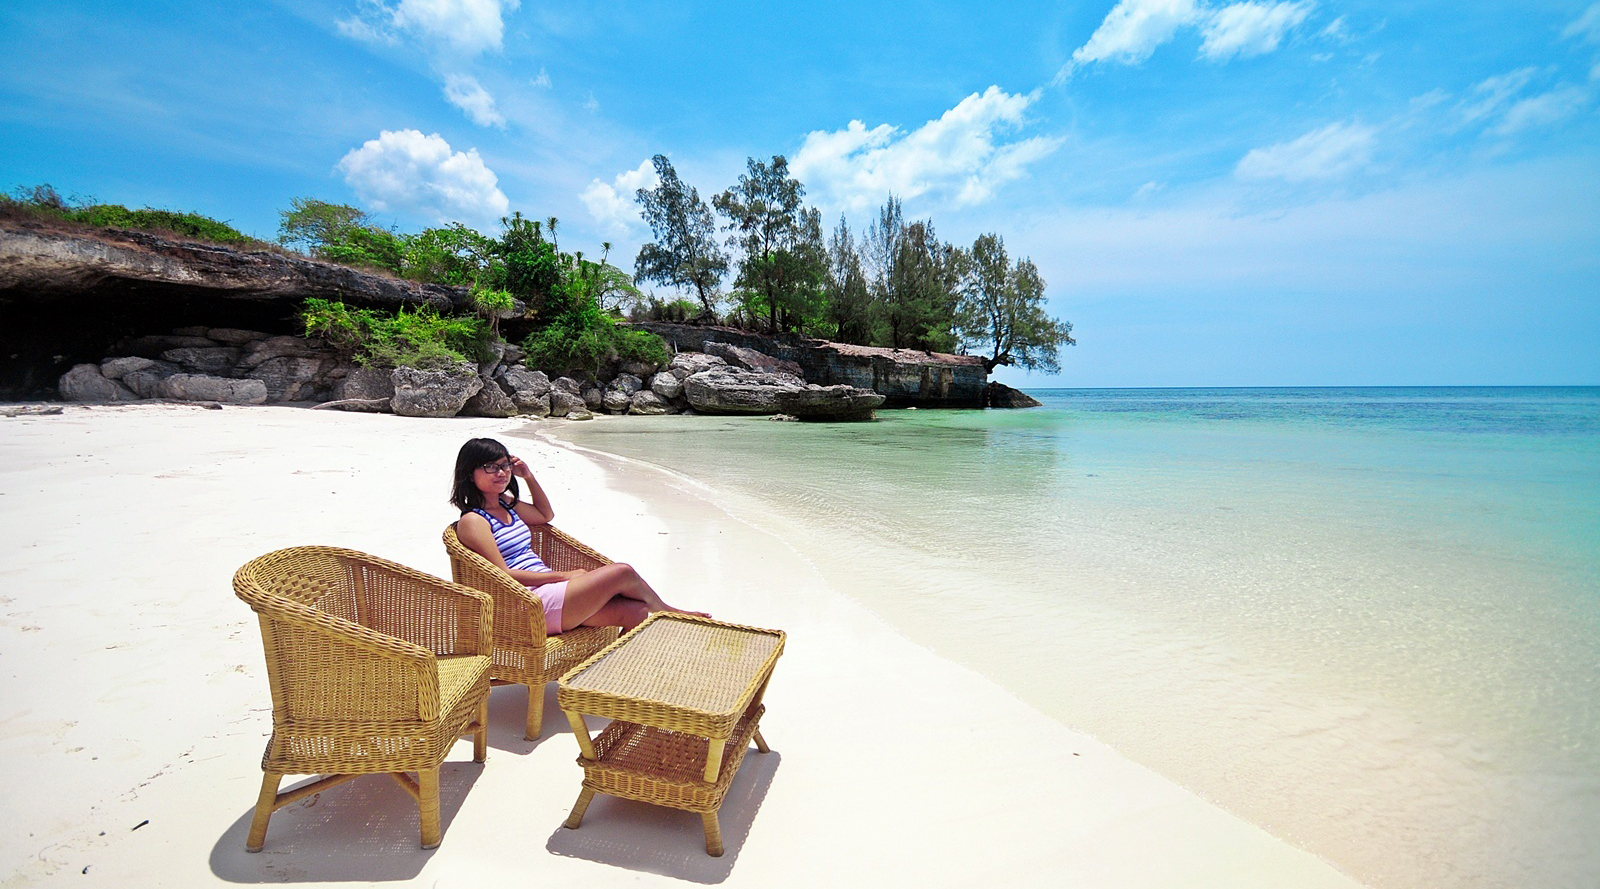 Pantai Baloiya tempat wisata pantai makassar reklamasi pantai makassar 2016 pantai seruni makassar selayar indah dan seksi cewek manis pamer paha mulus indah